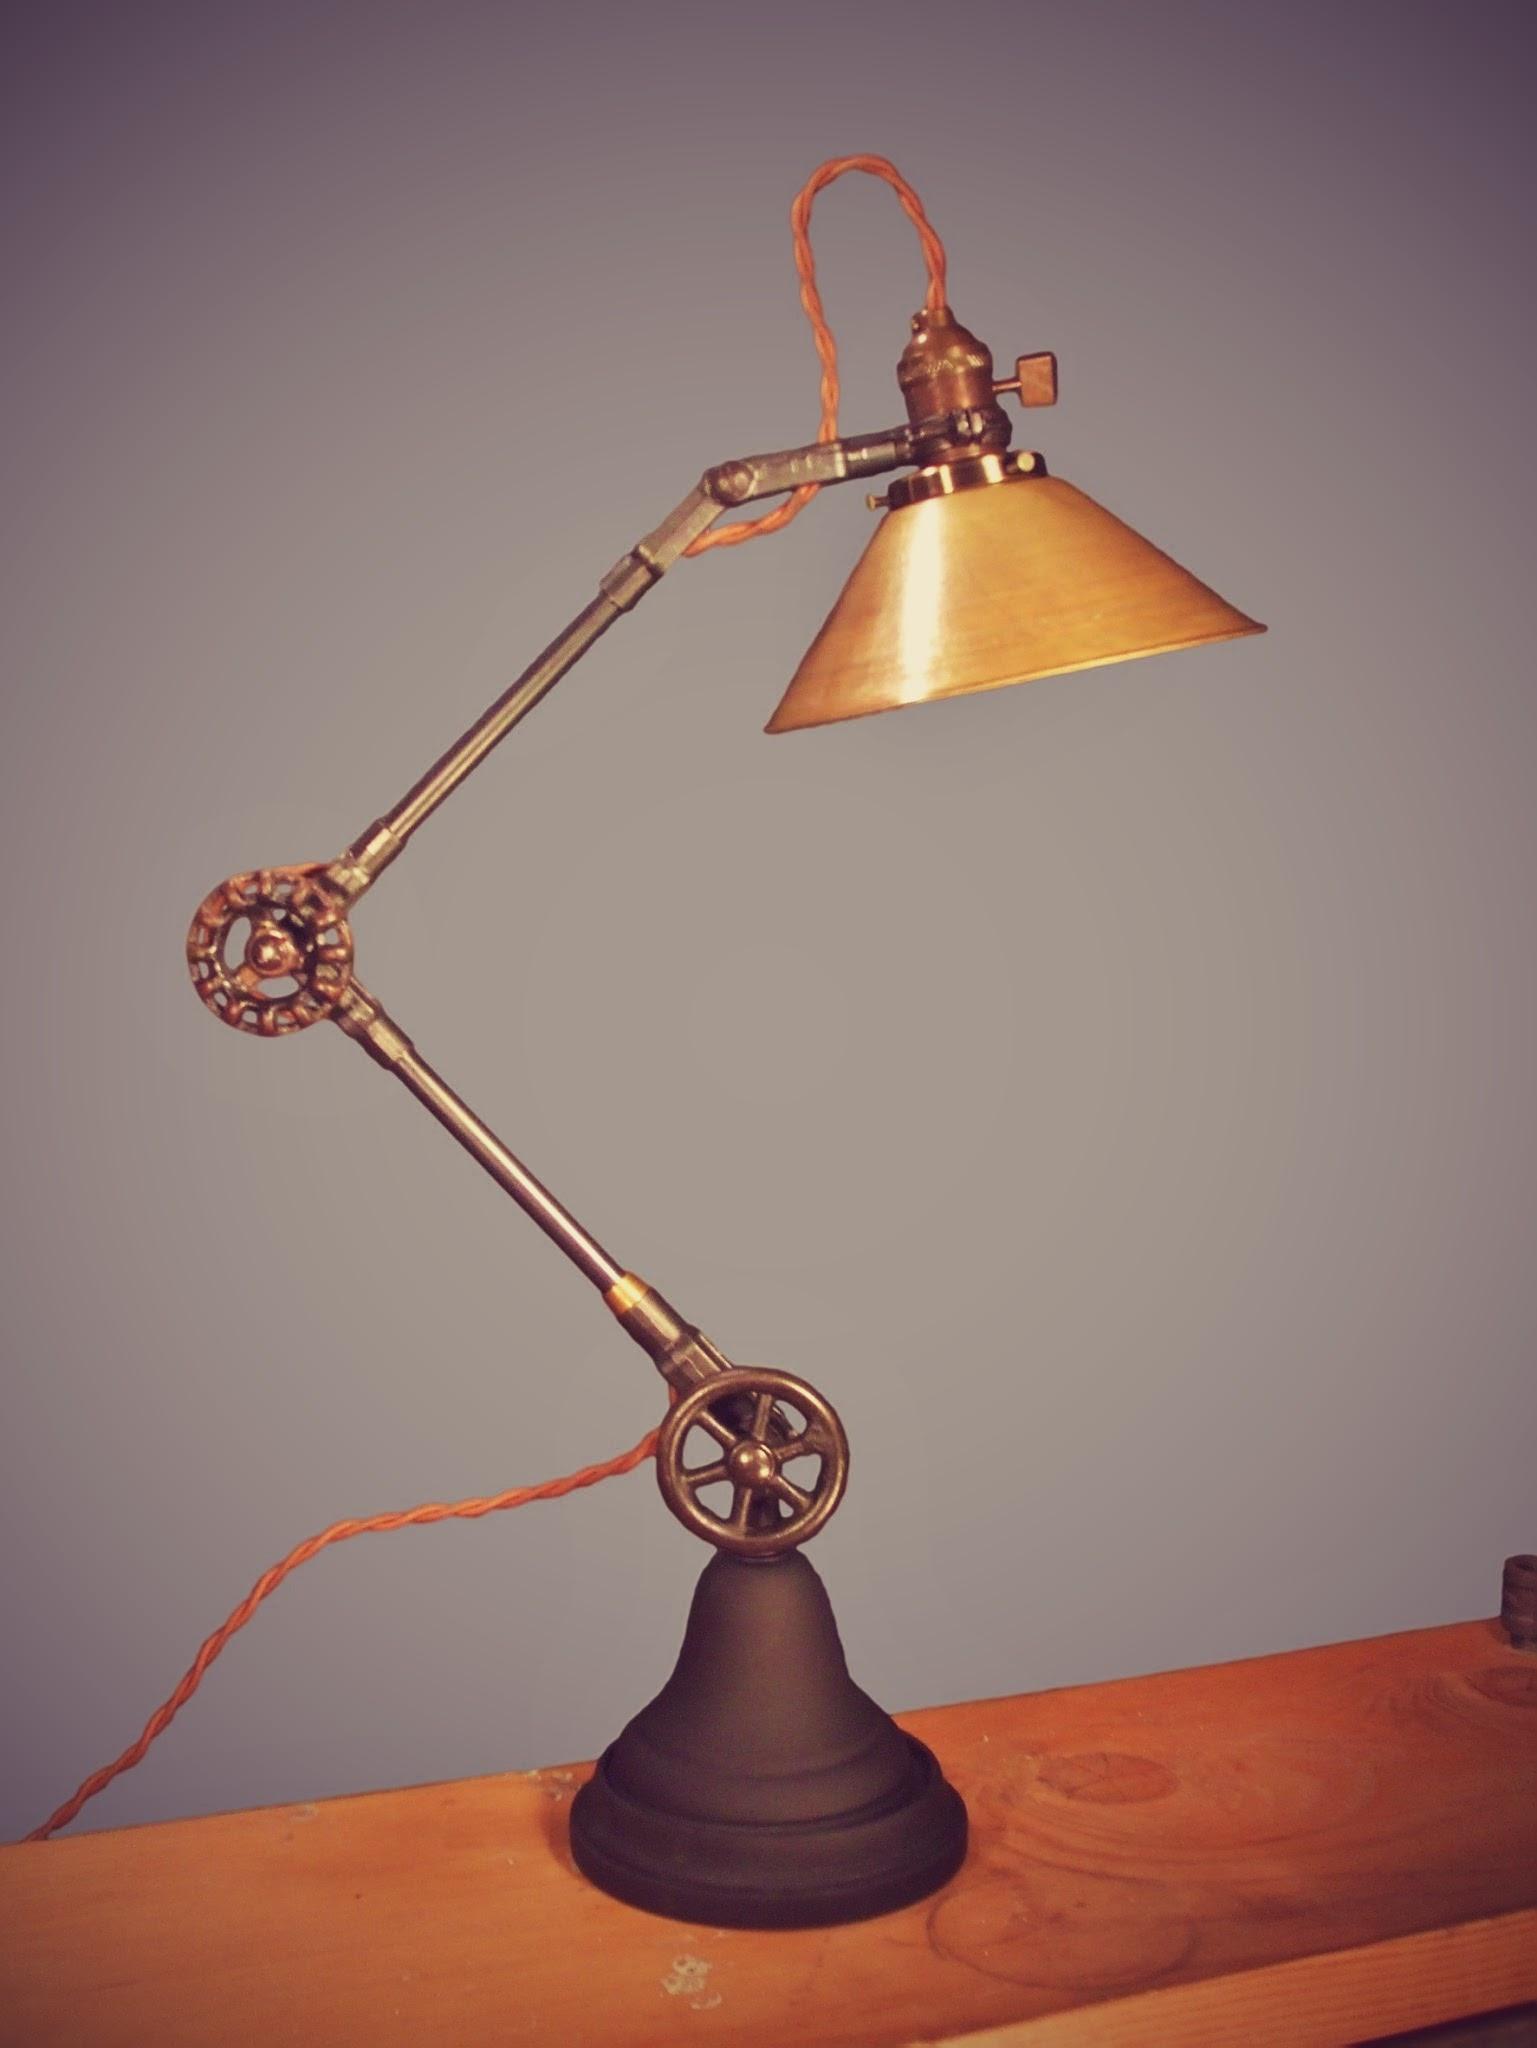 vintage industrial style desk lamp dw vintage lighting co online store powered by storenvy. Black Bedroom Furniture Sets. Home Design Ideas